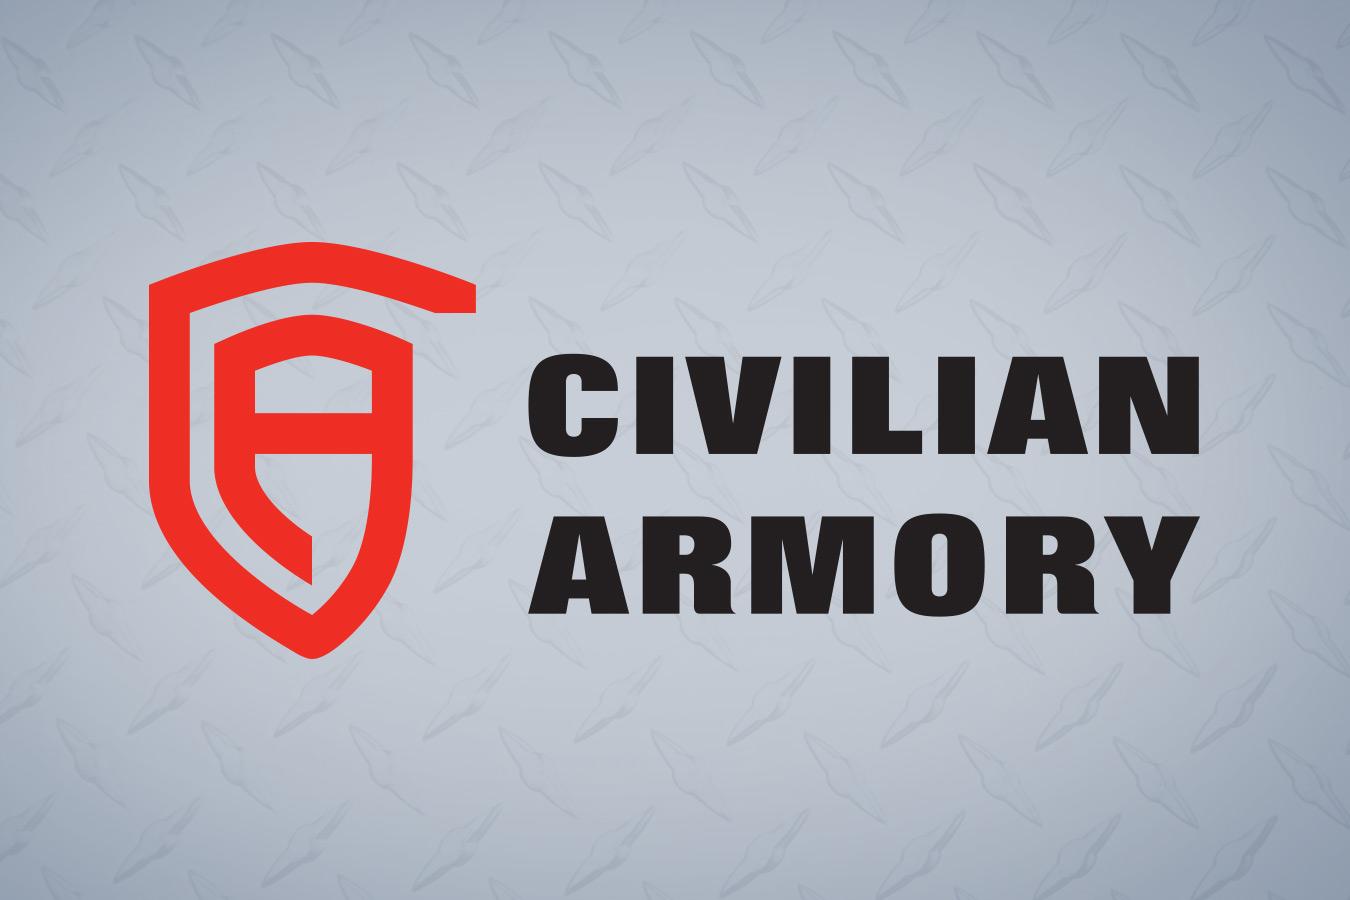 Civilian Armory logo